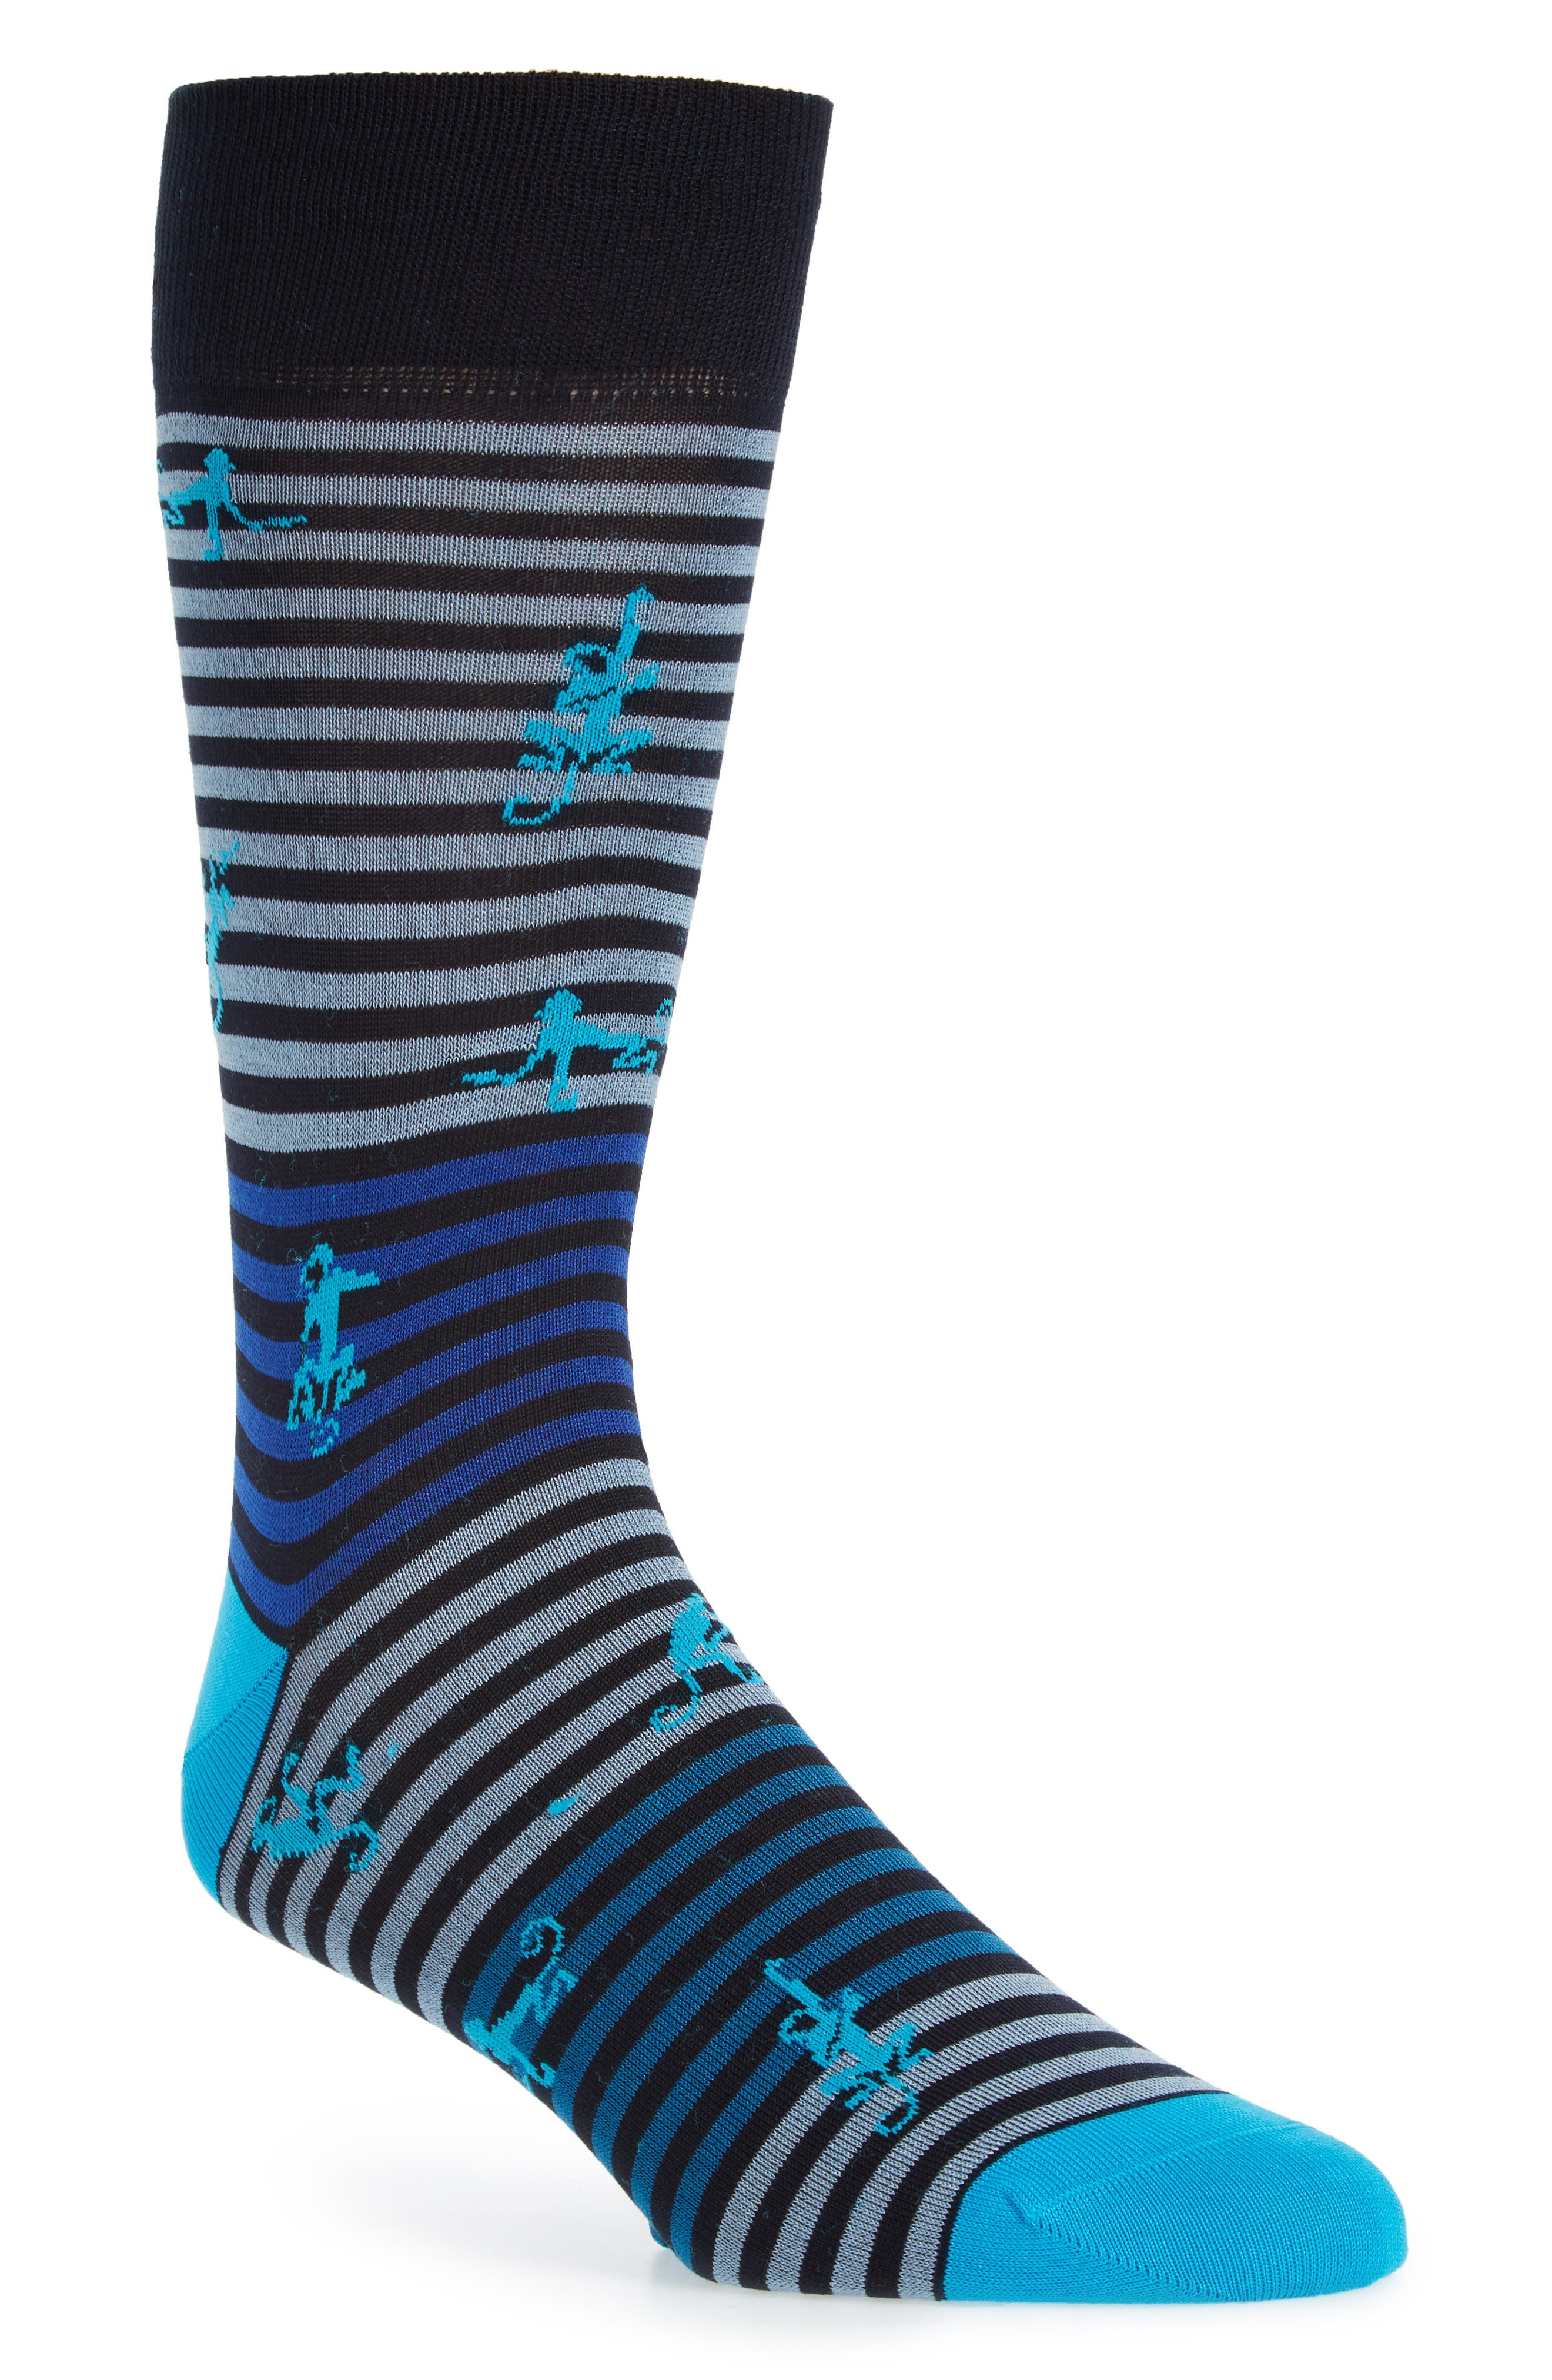 Monkey Mercerized Cotton Blend Socks,                             Main thumbnail 1, color,                             Aqua